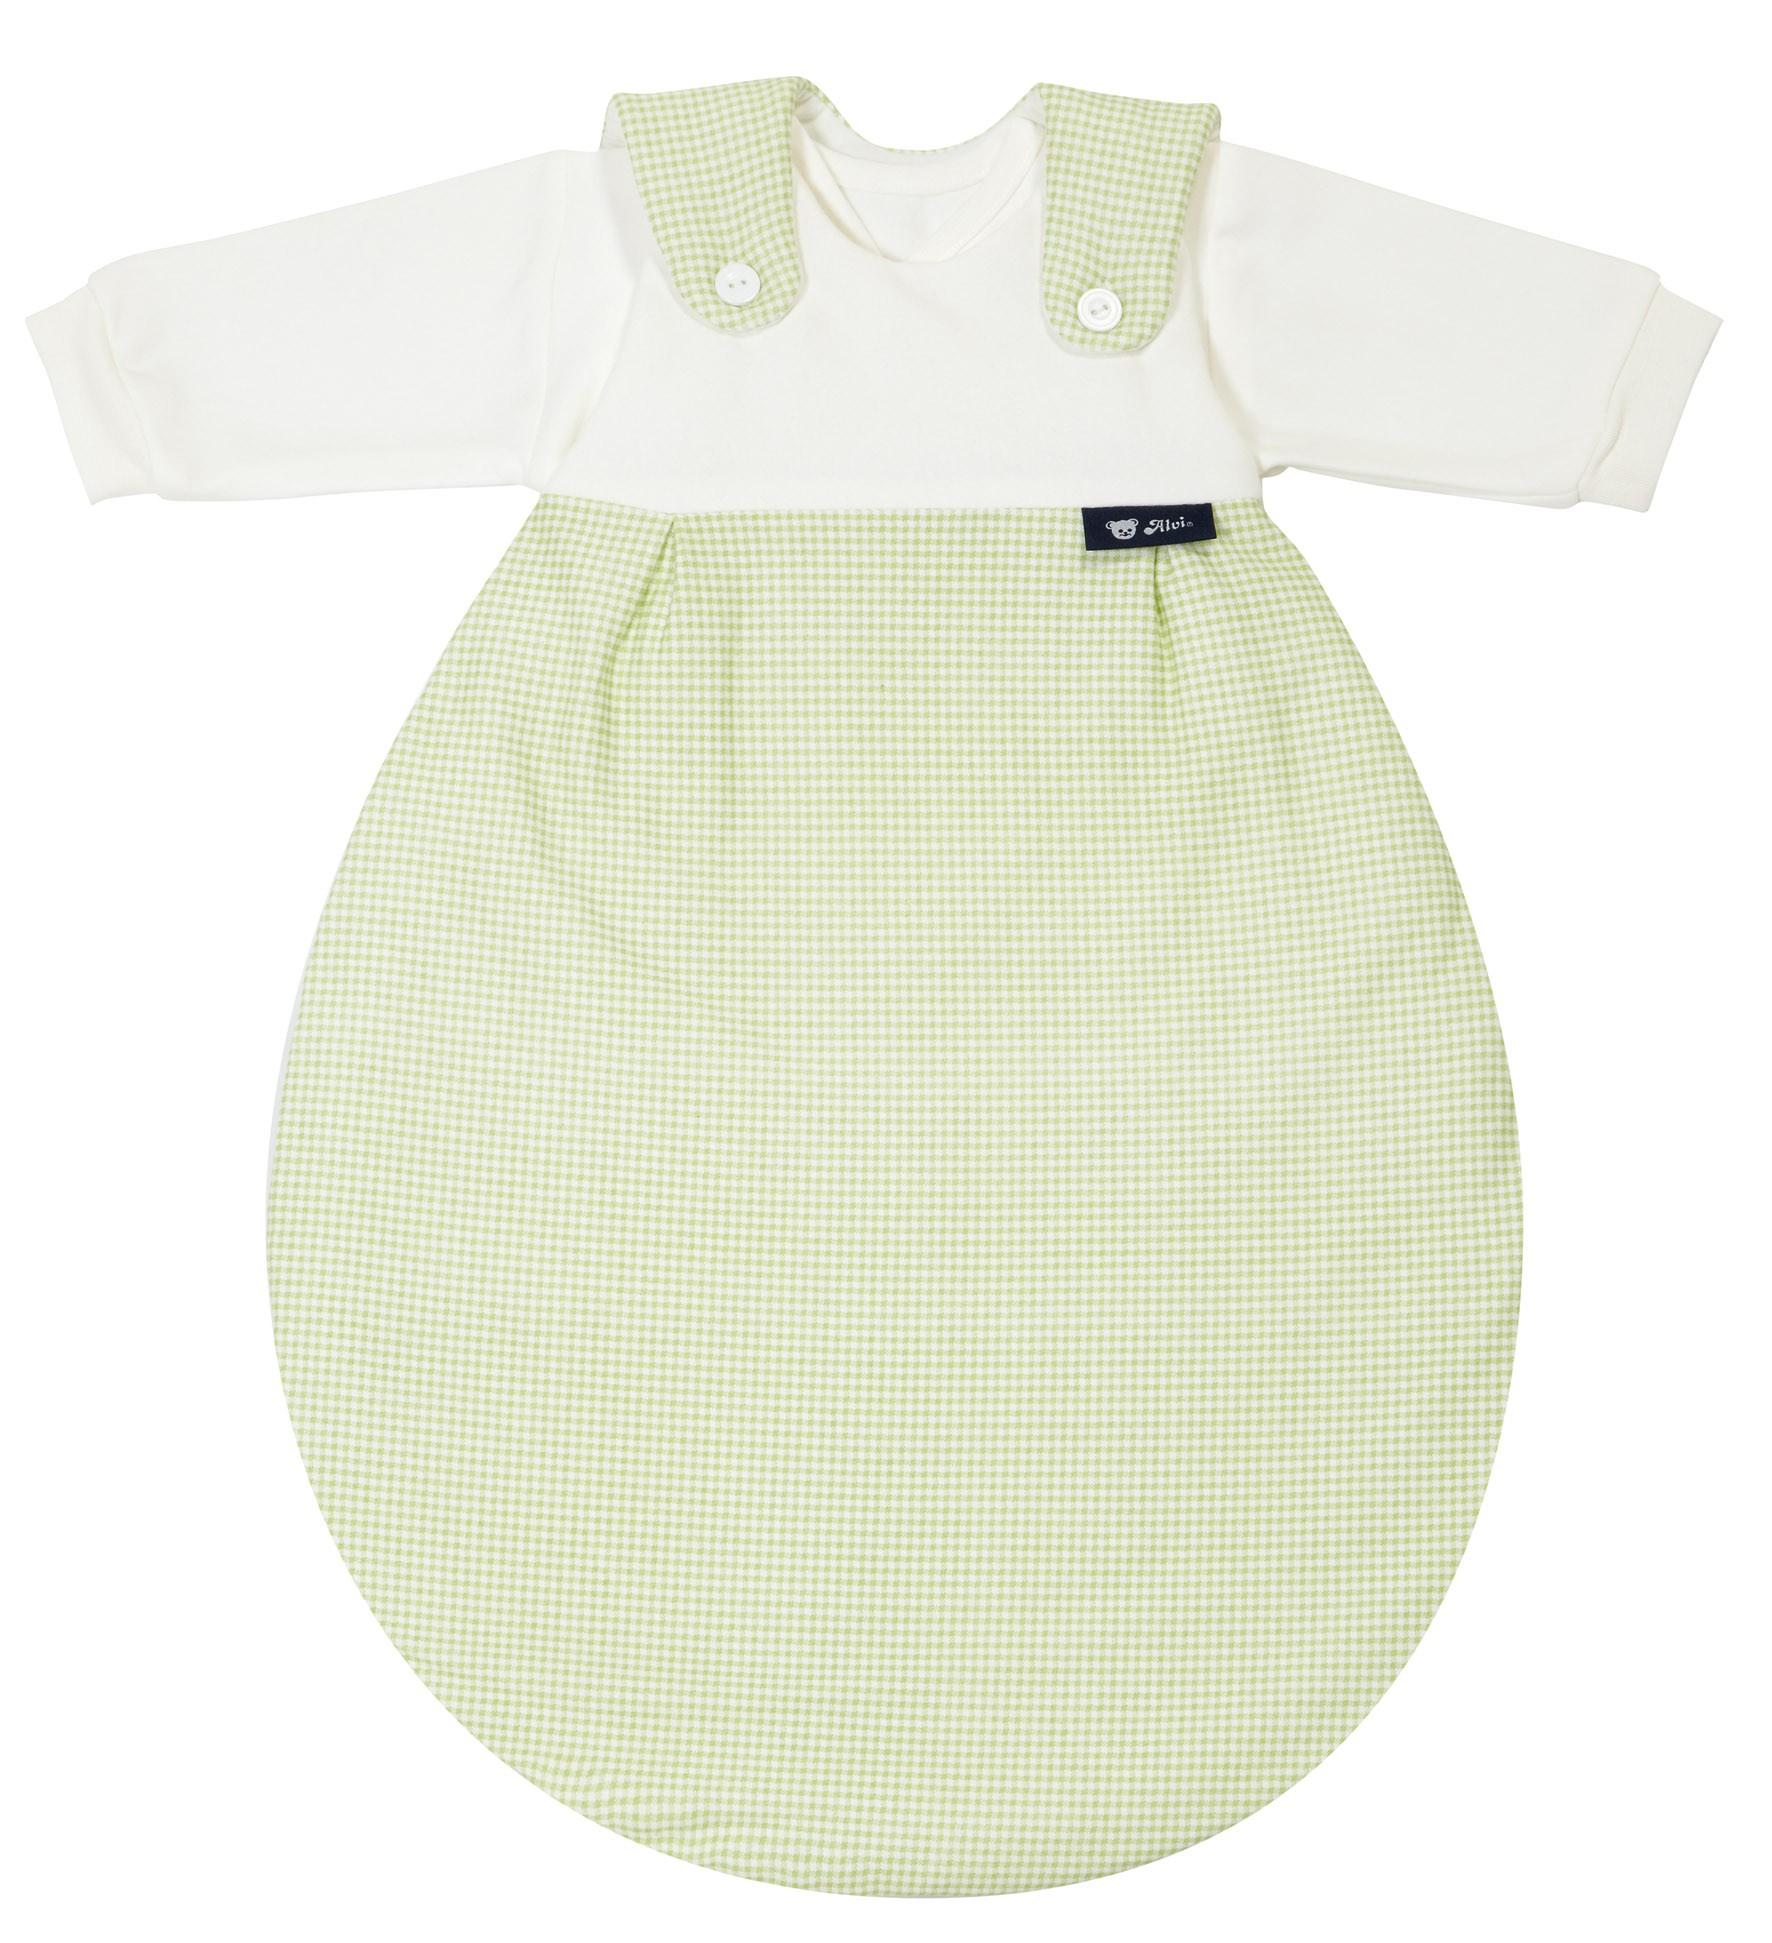 Alvi Baby Mäxchen 372-3 Karo grün